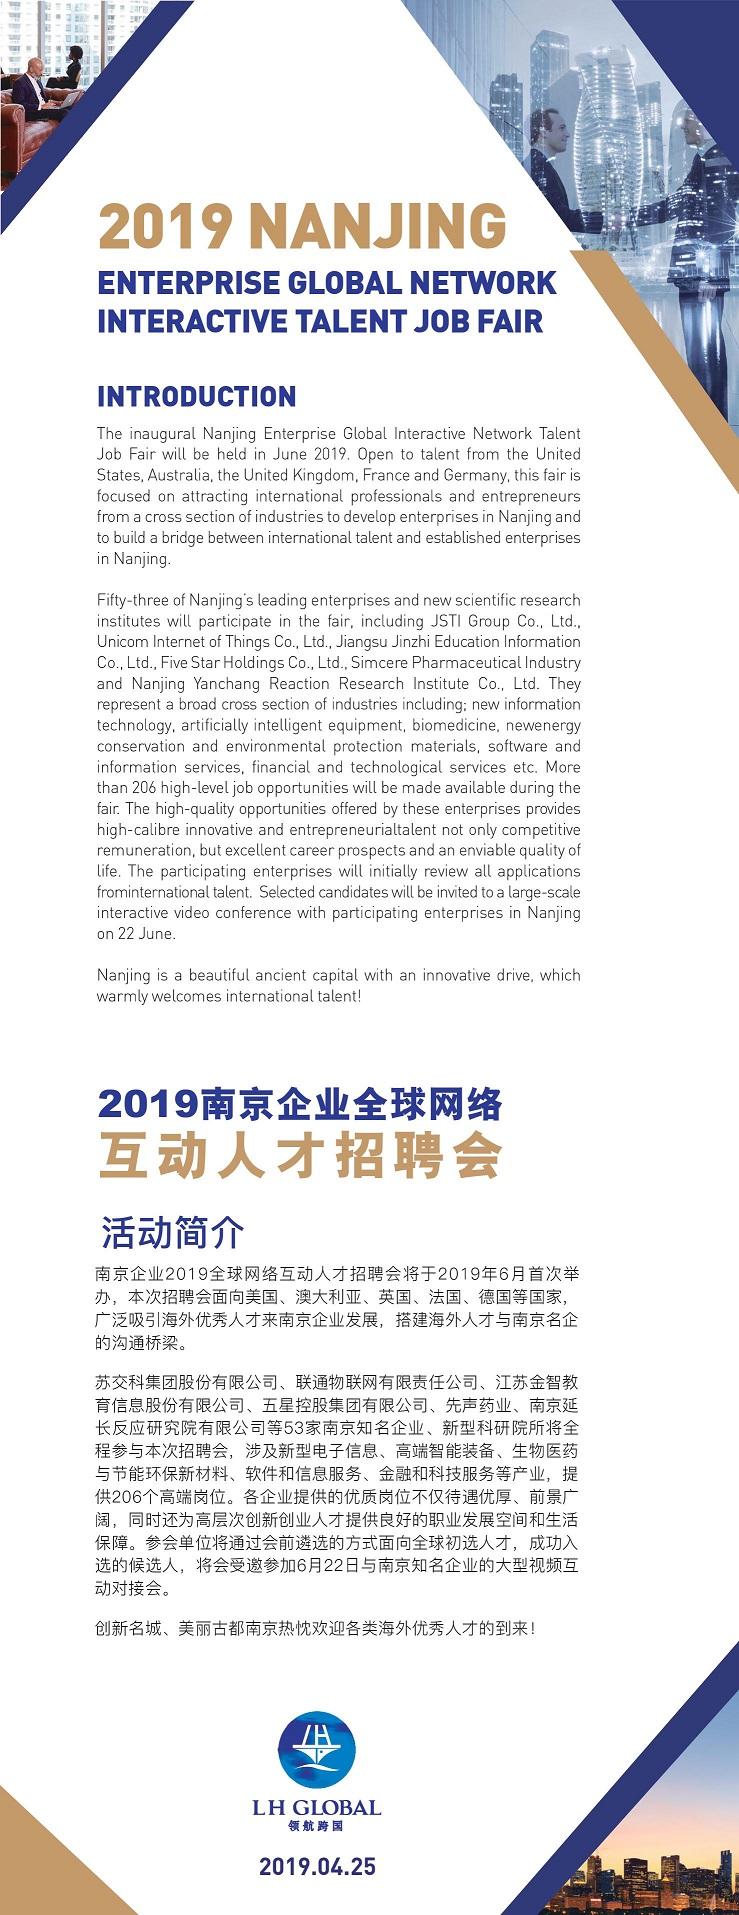 2019 Nanjing Enterprise Global Network Interactive Talent